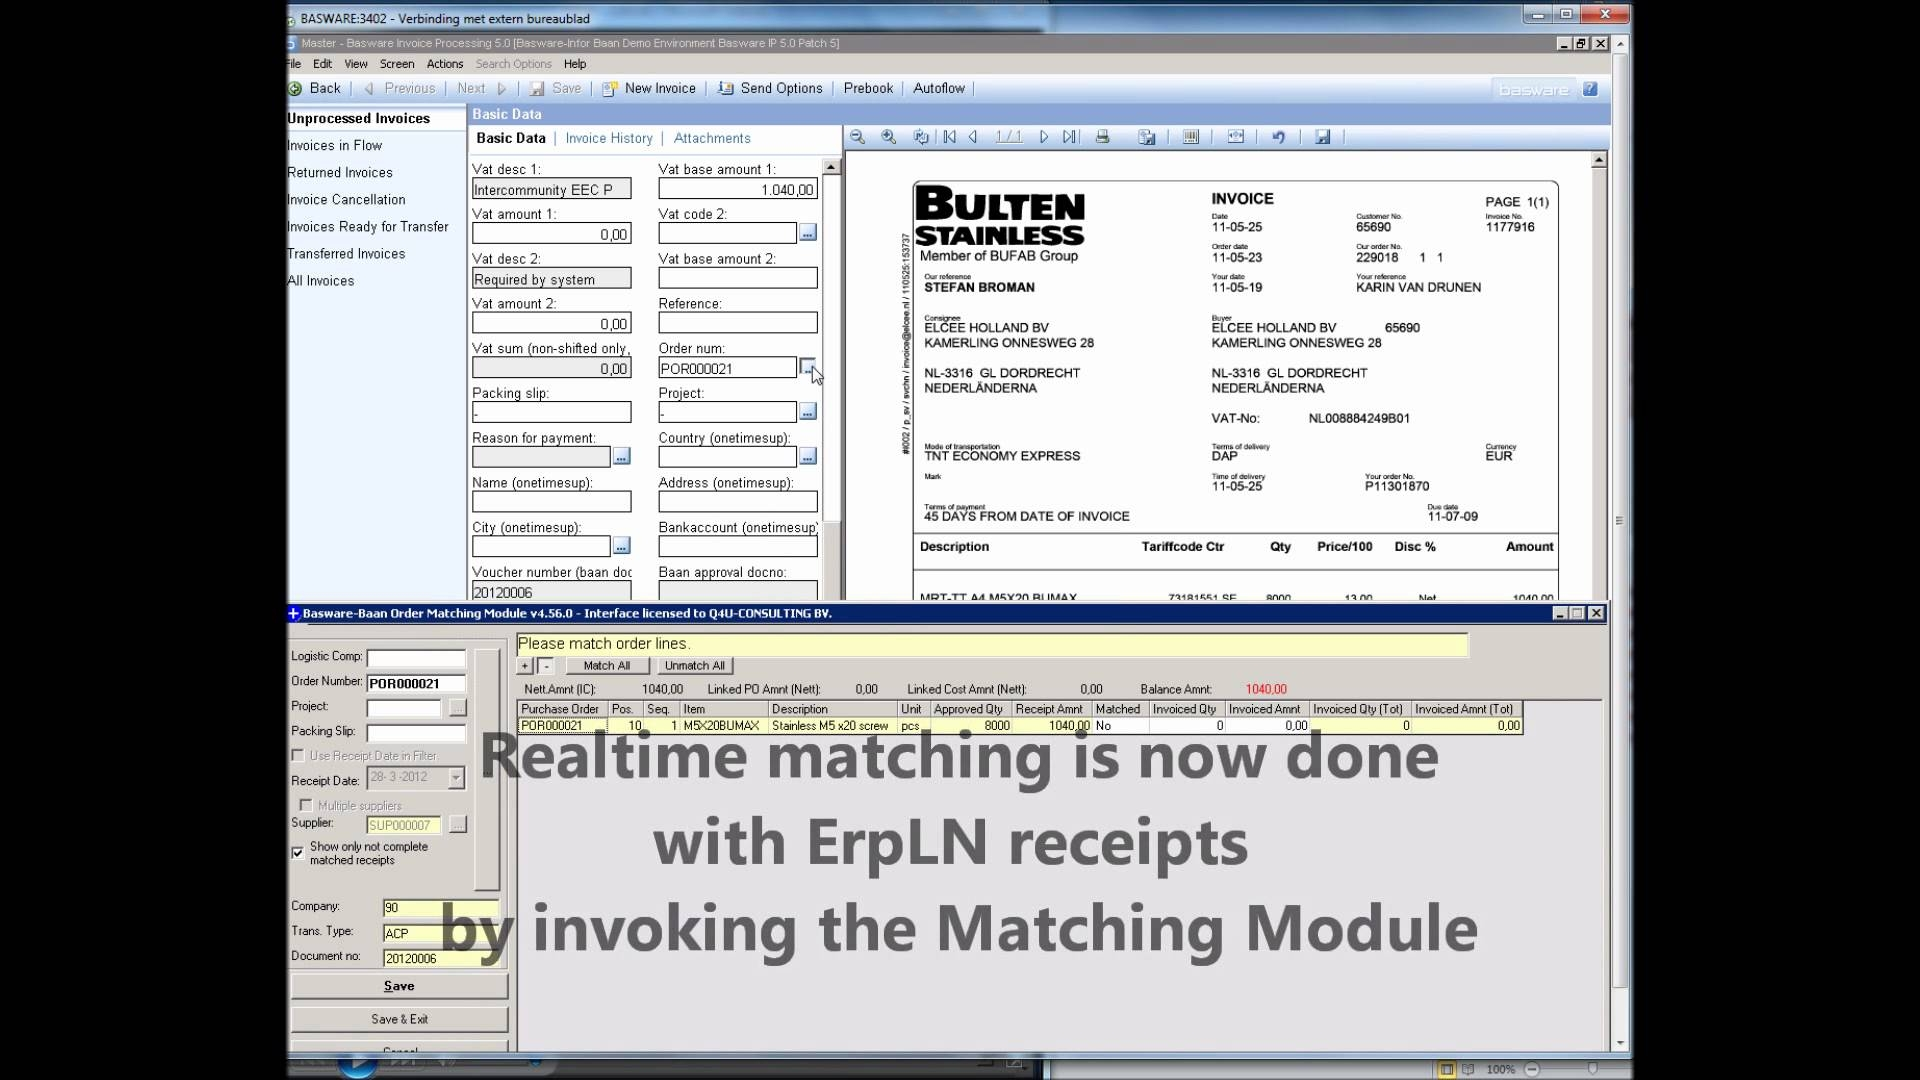 part 3 goods trade invoice basware baan integration live demo basware invoice processing